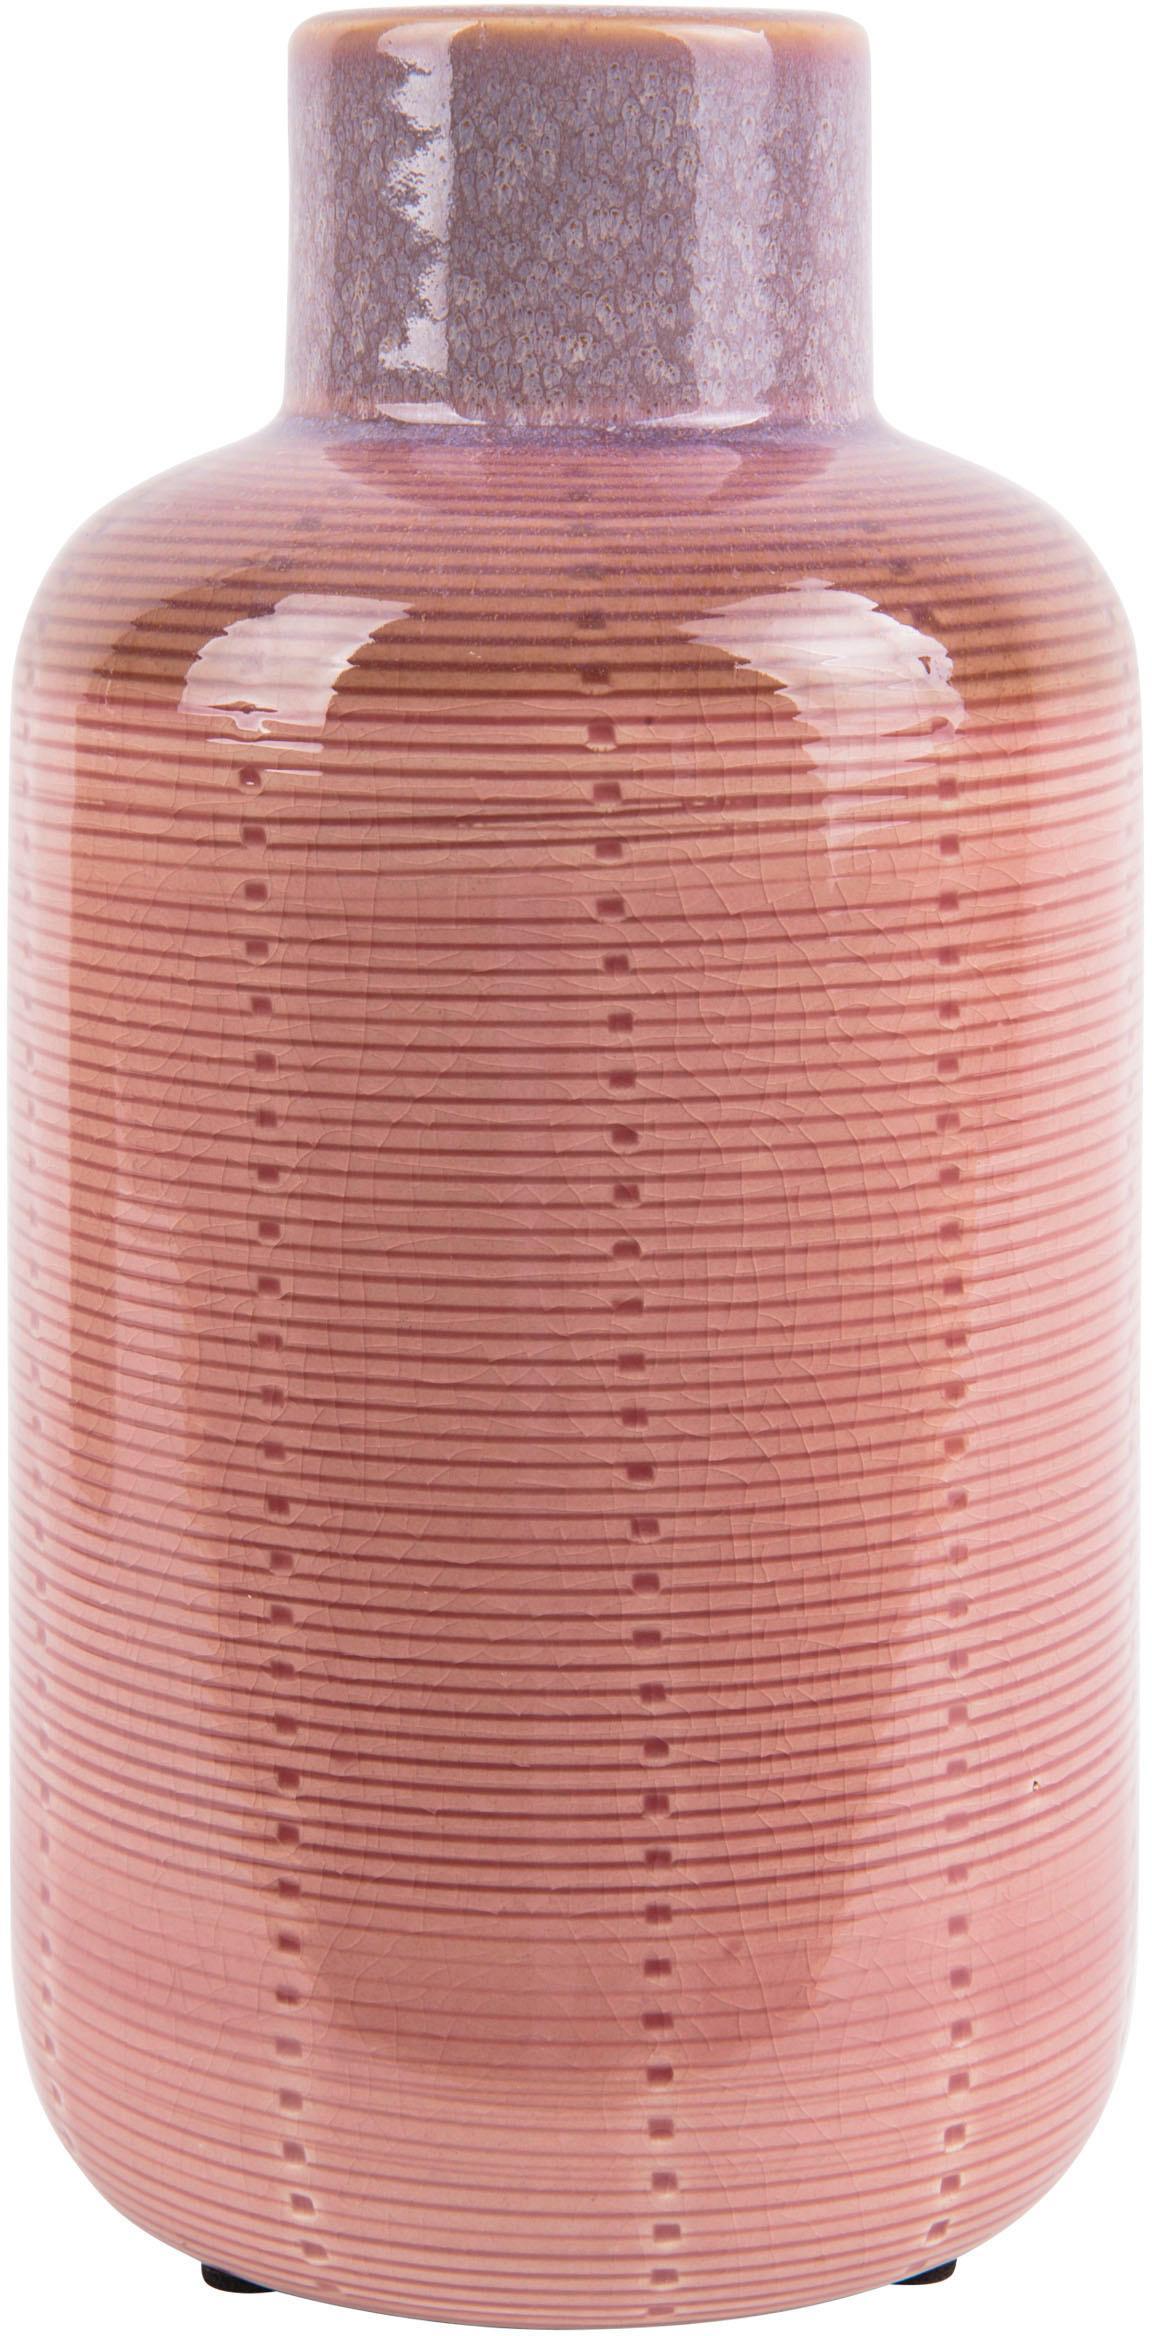 Vase Bottle aus Keramik, Keramik, Rosa, Ø 12 x H 23 cm